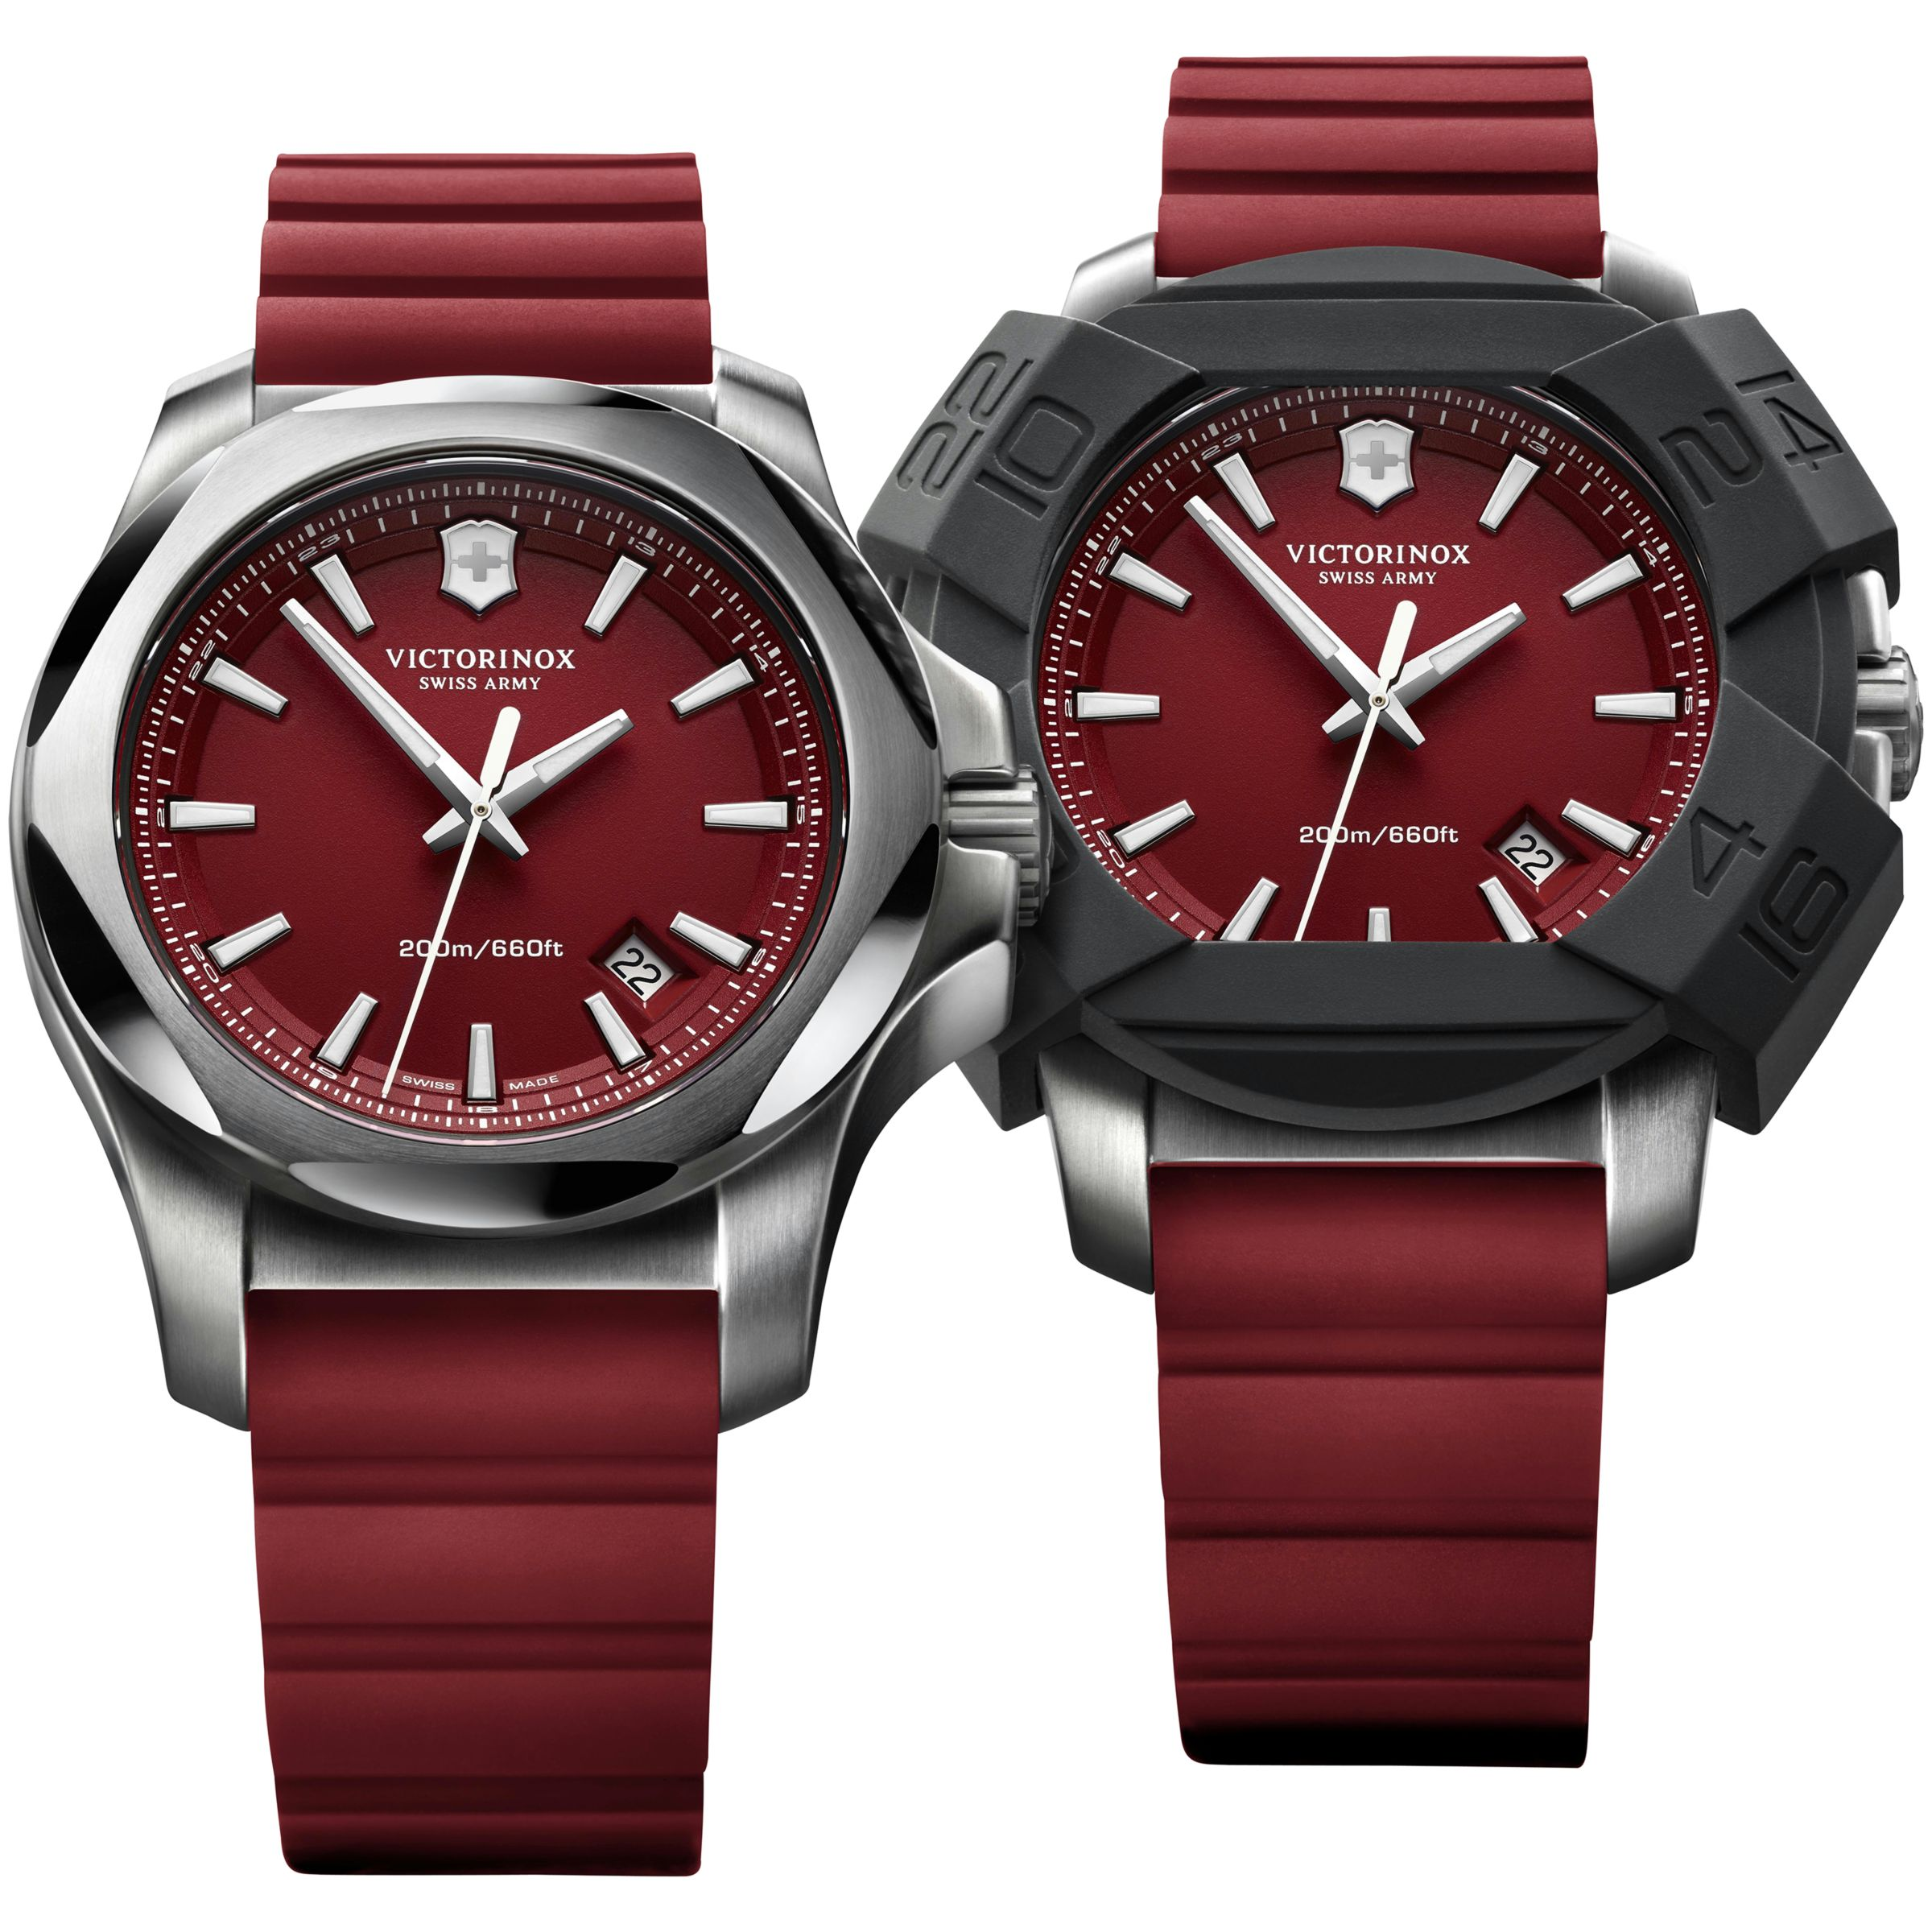 Victorinox Victorinox 241719.1 Men's I.N.O.X Rubber Strap Watch, Red